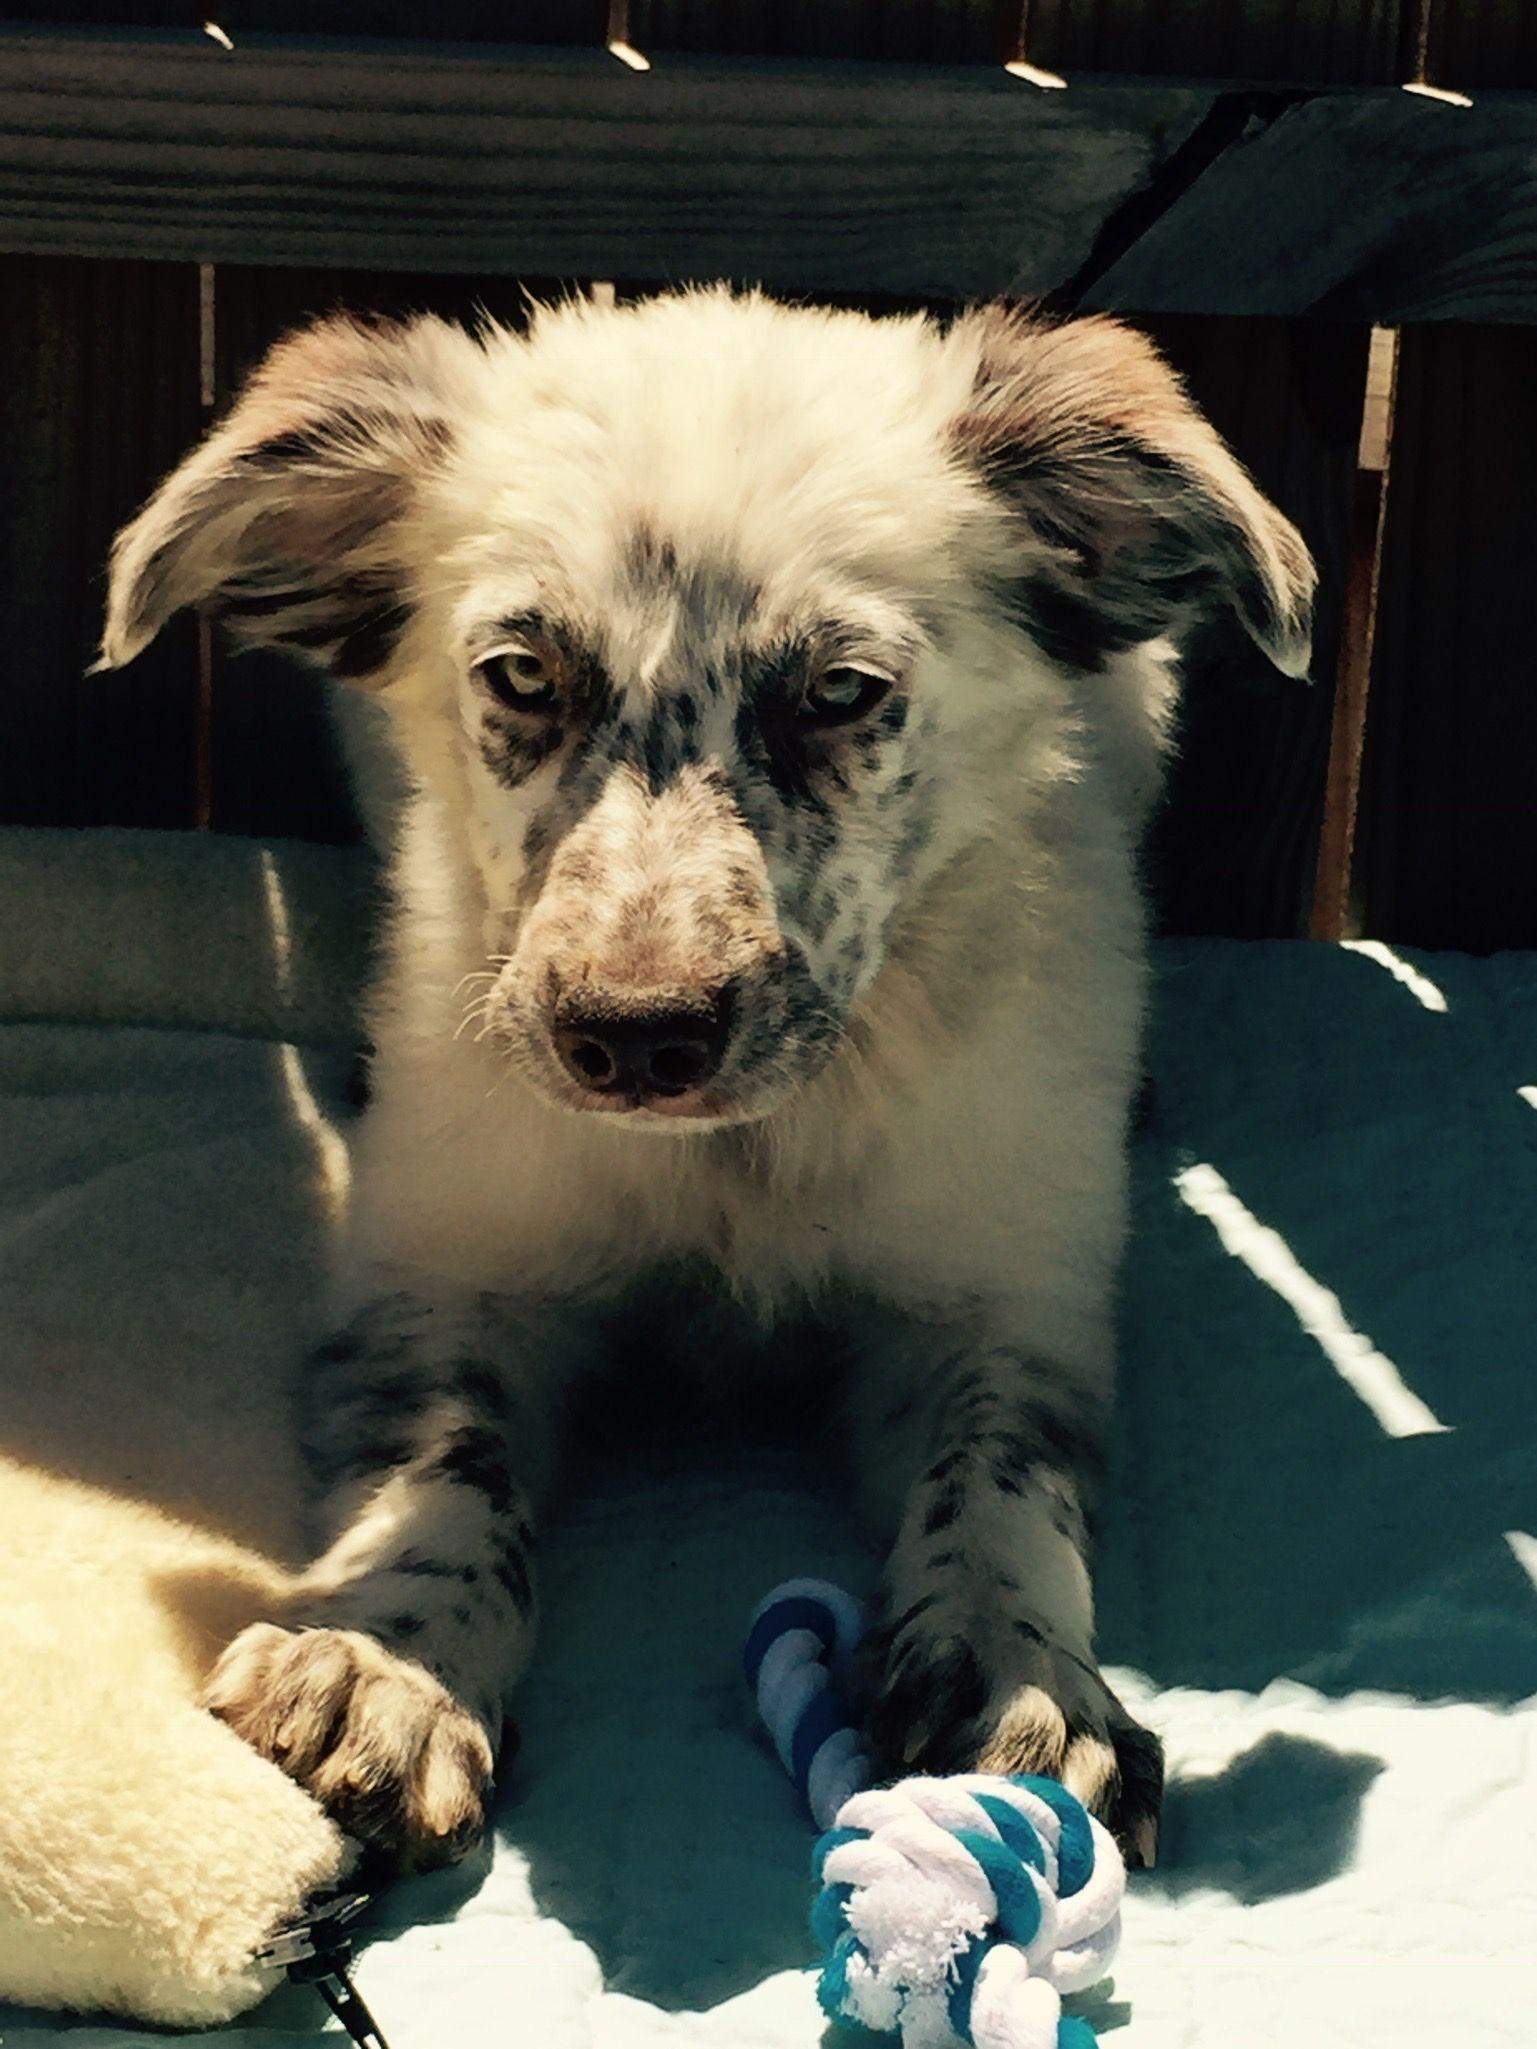 Australian Shepherd dog for Adoption in Del Rio, TX. ADN-554941 on PuppyFinder.com Gender: Female. Age: Young